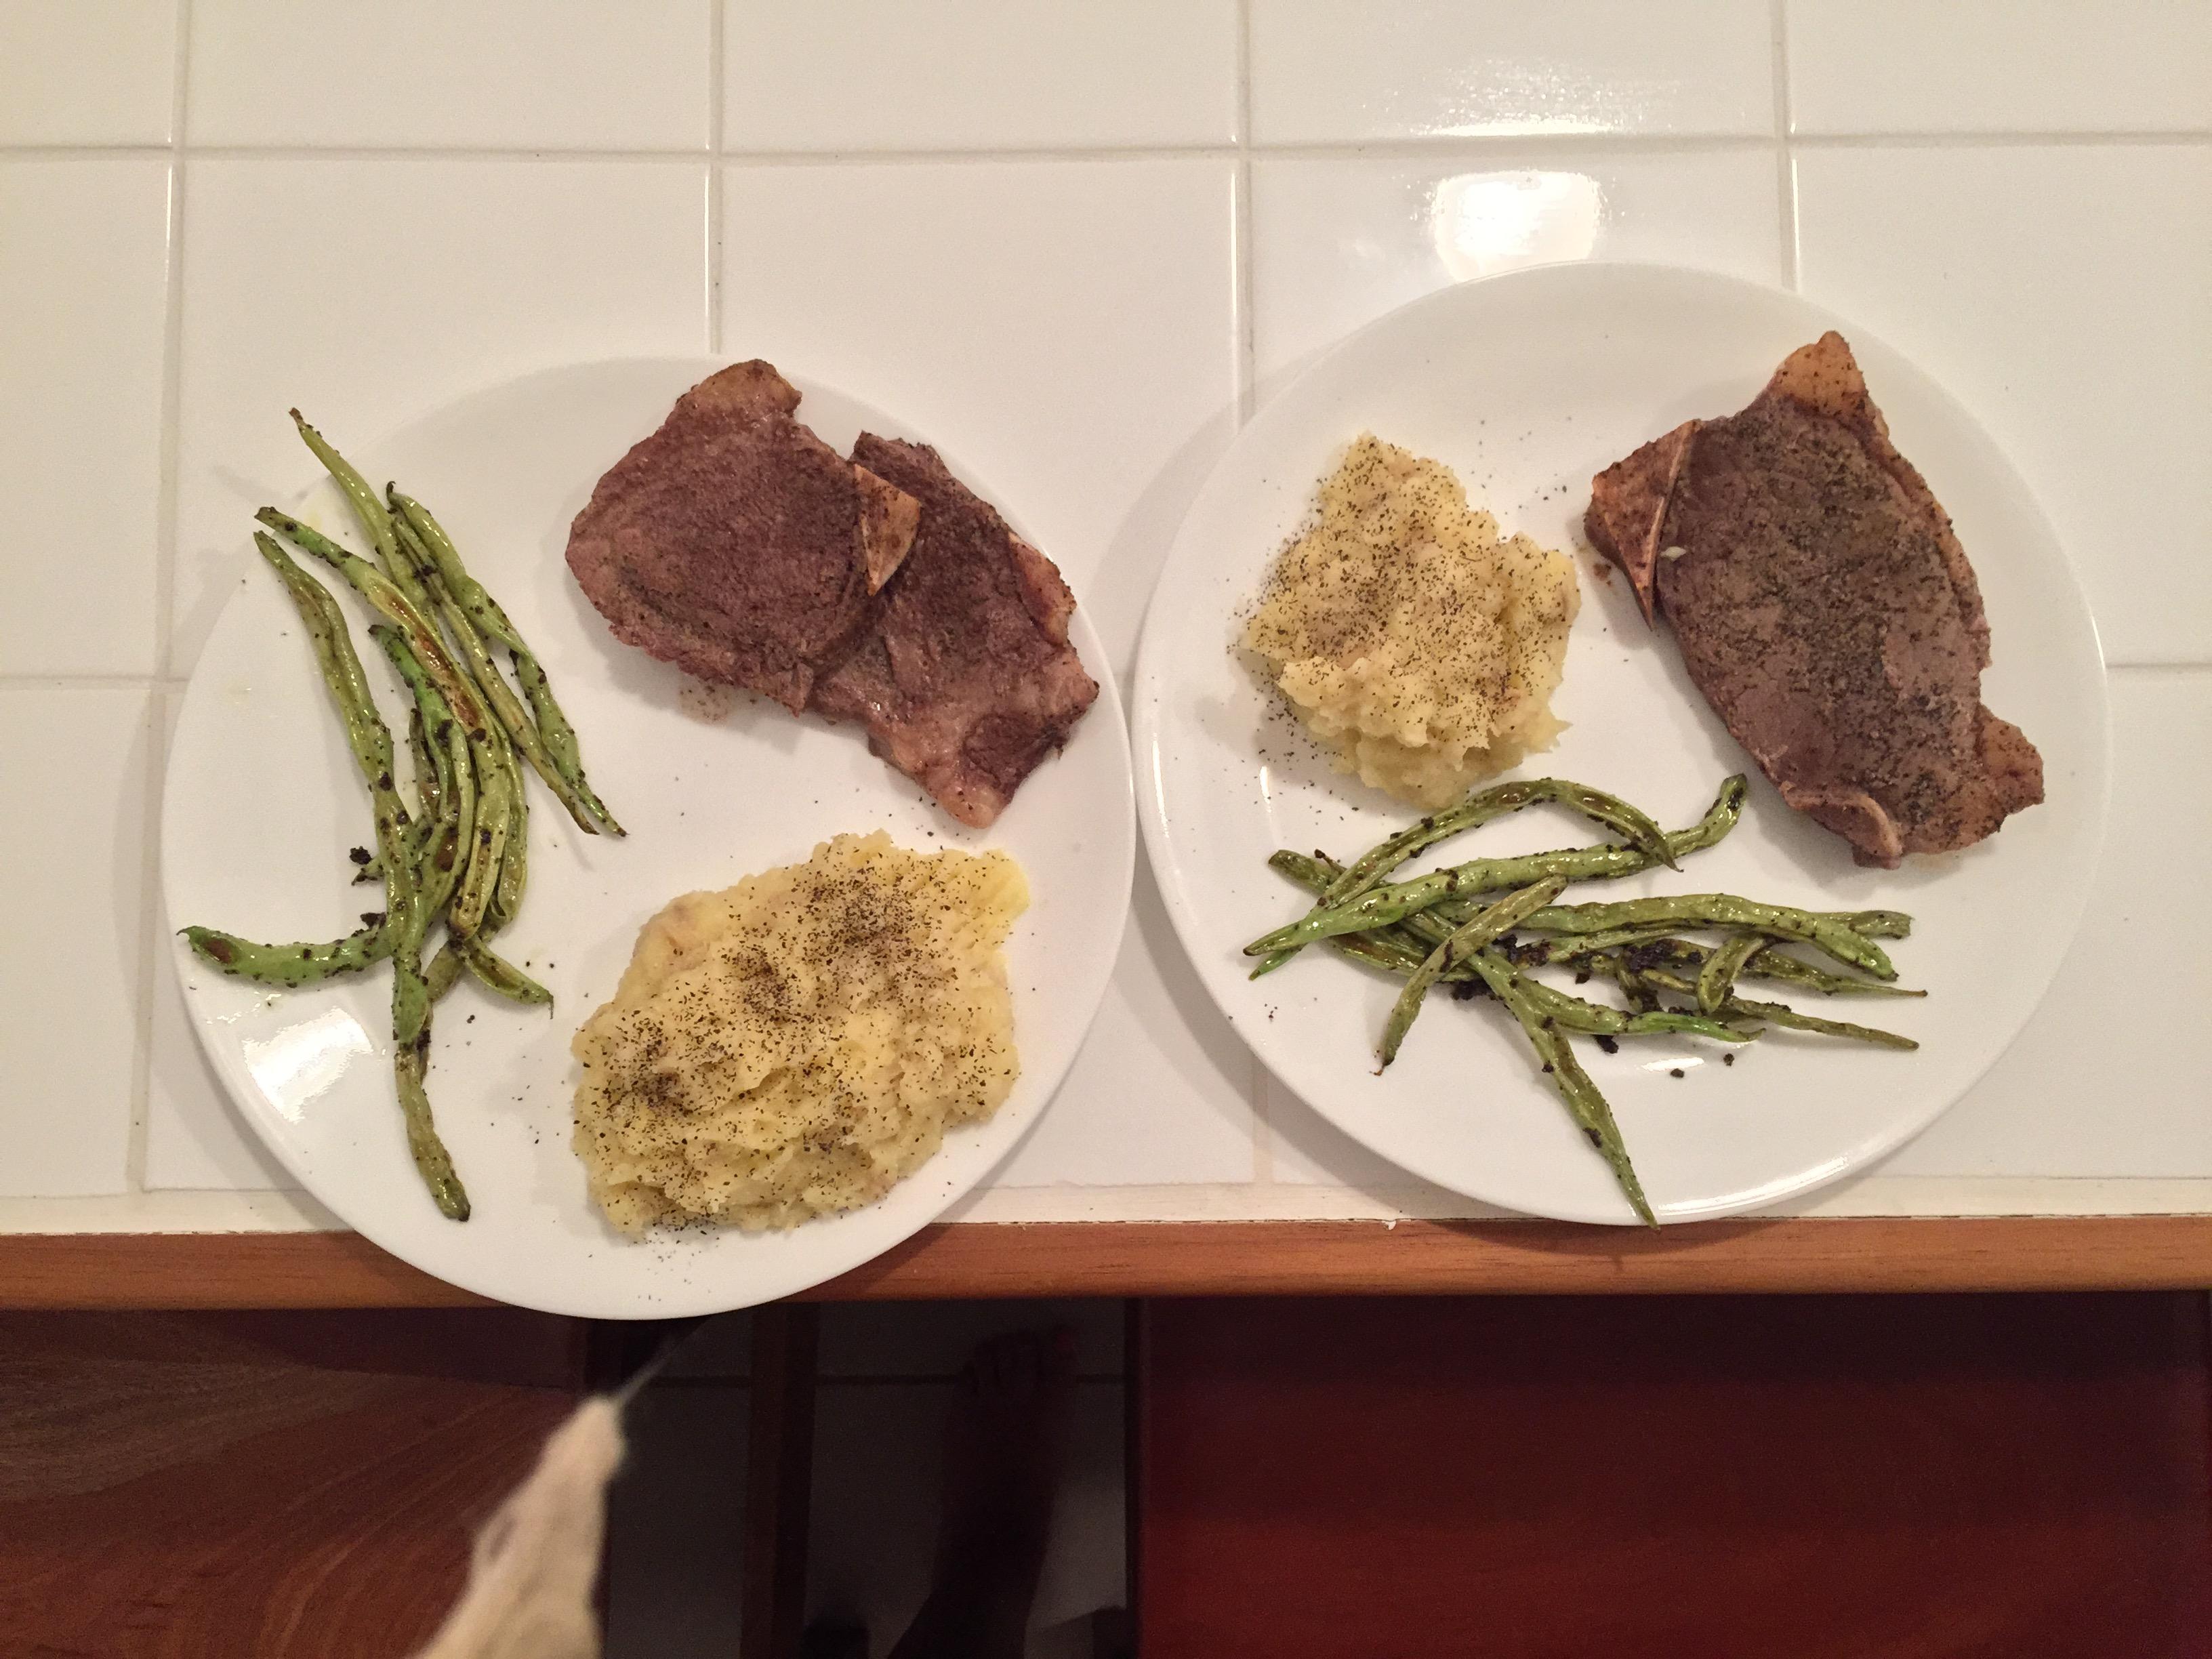 Home made steak and mash potatoes $7